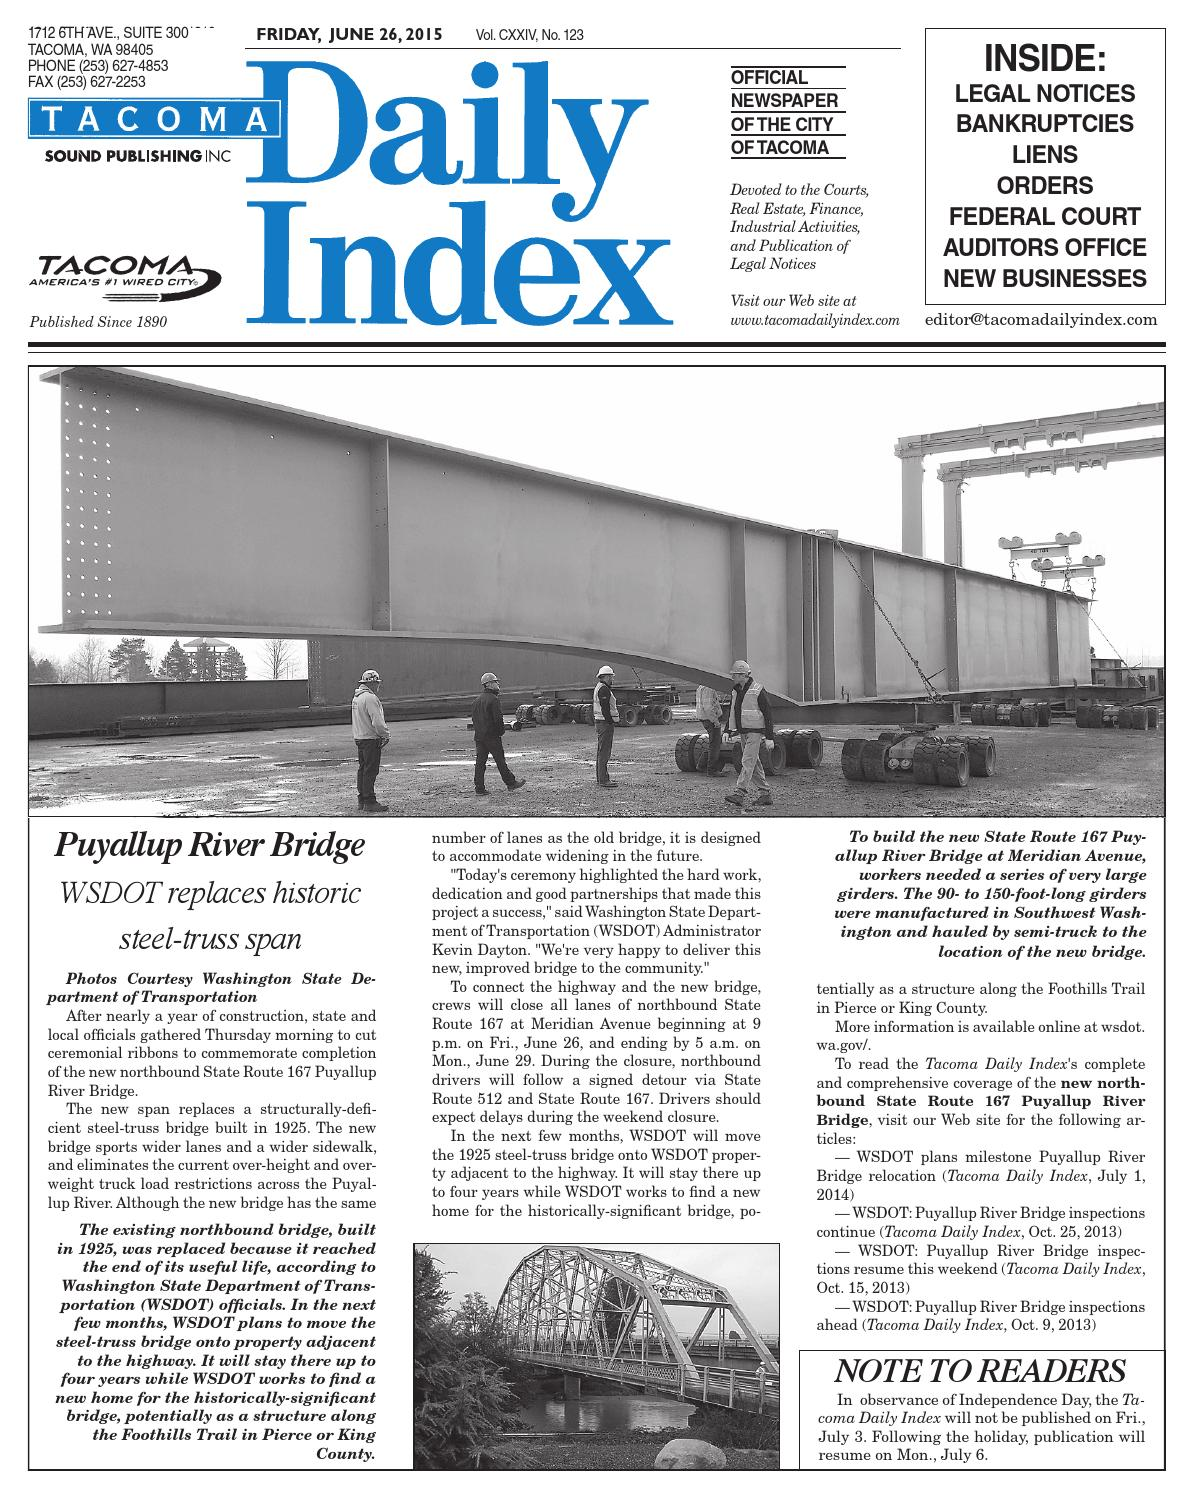 Tacoma Daily Index June 26 2015 By Sound Publishing Issuu